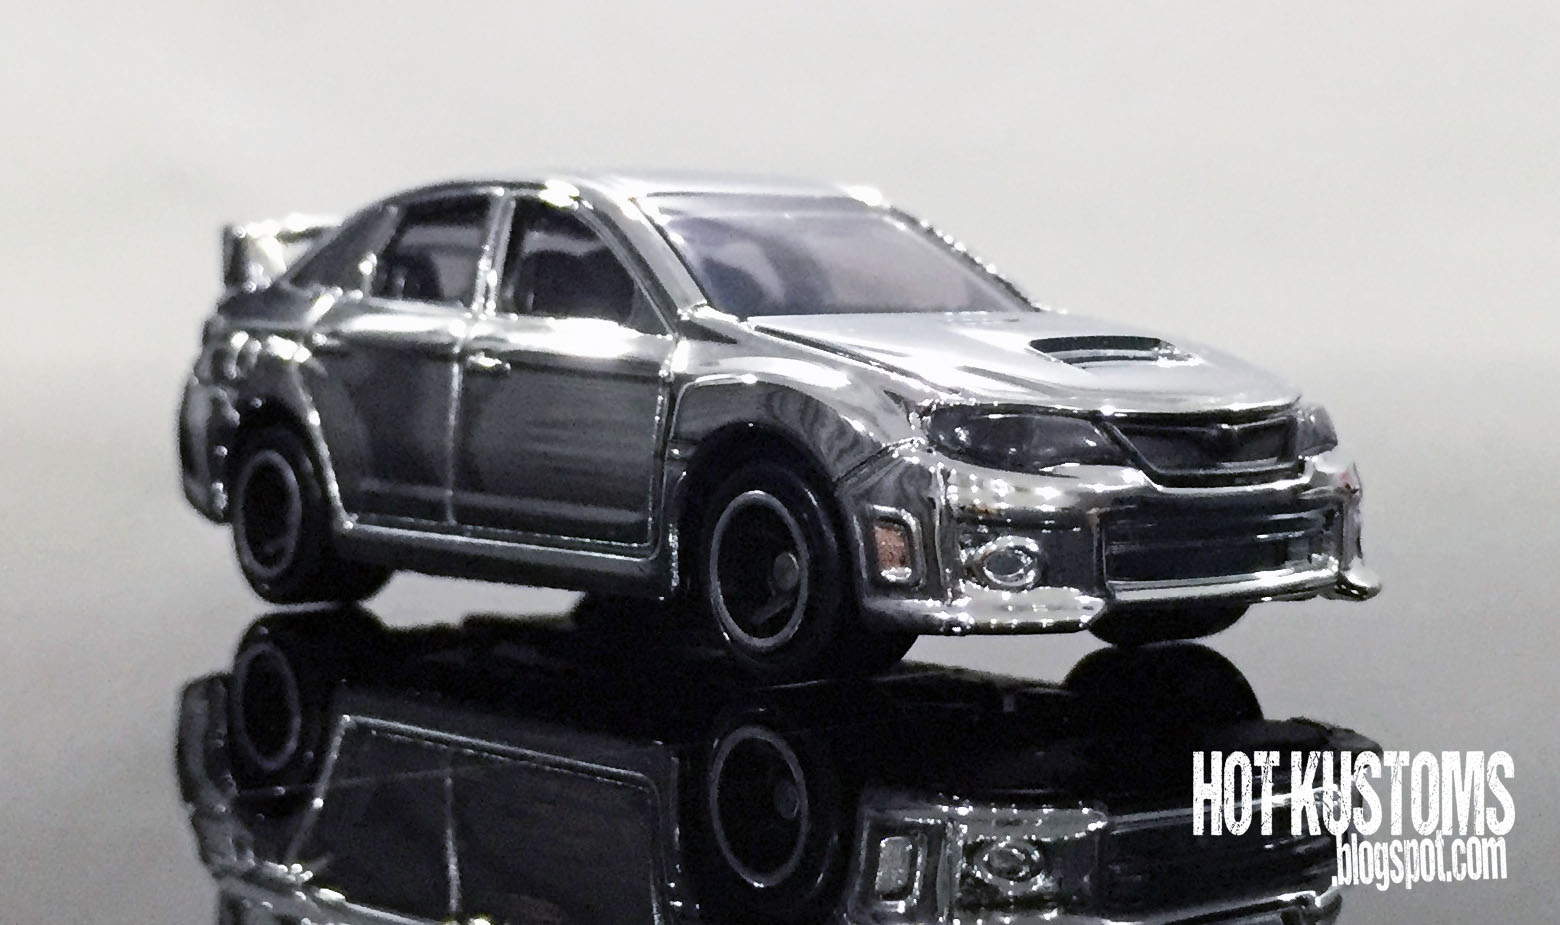 Subaru Wrx Sti For Sale >> Hot Kustoms Mini Cars Tomica Not For Sale Version Subaru